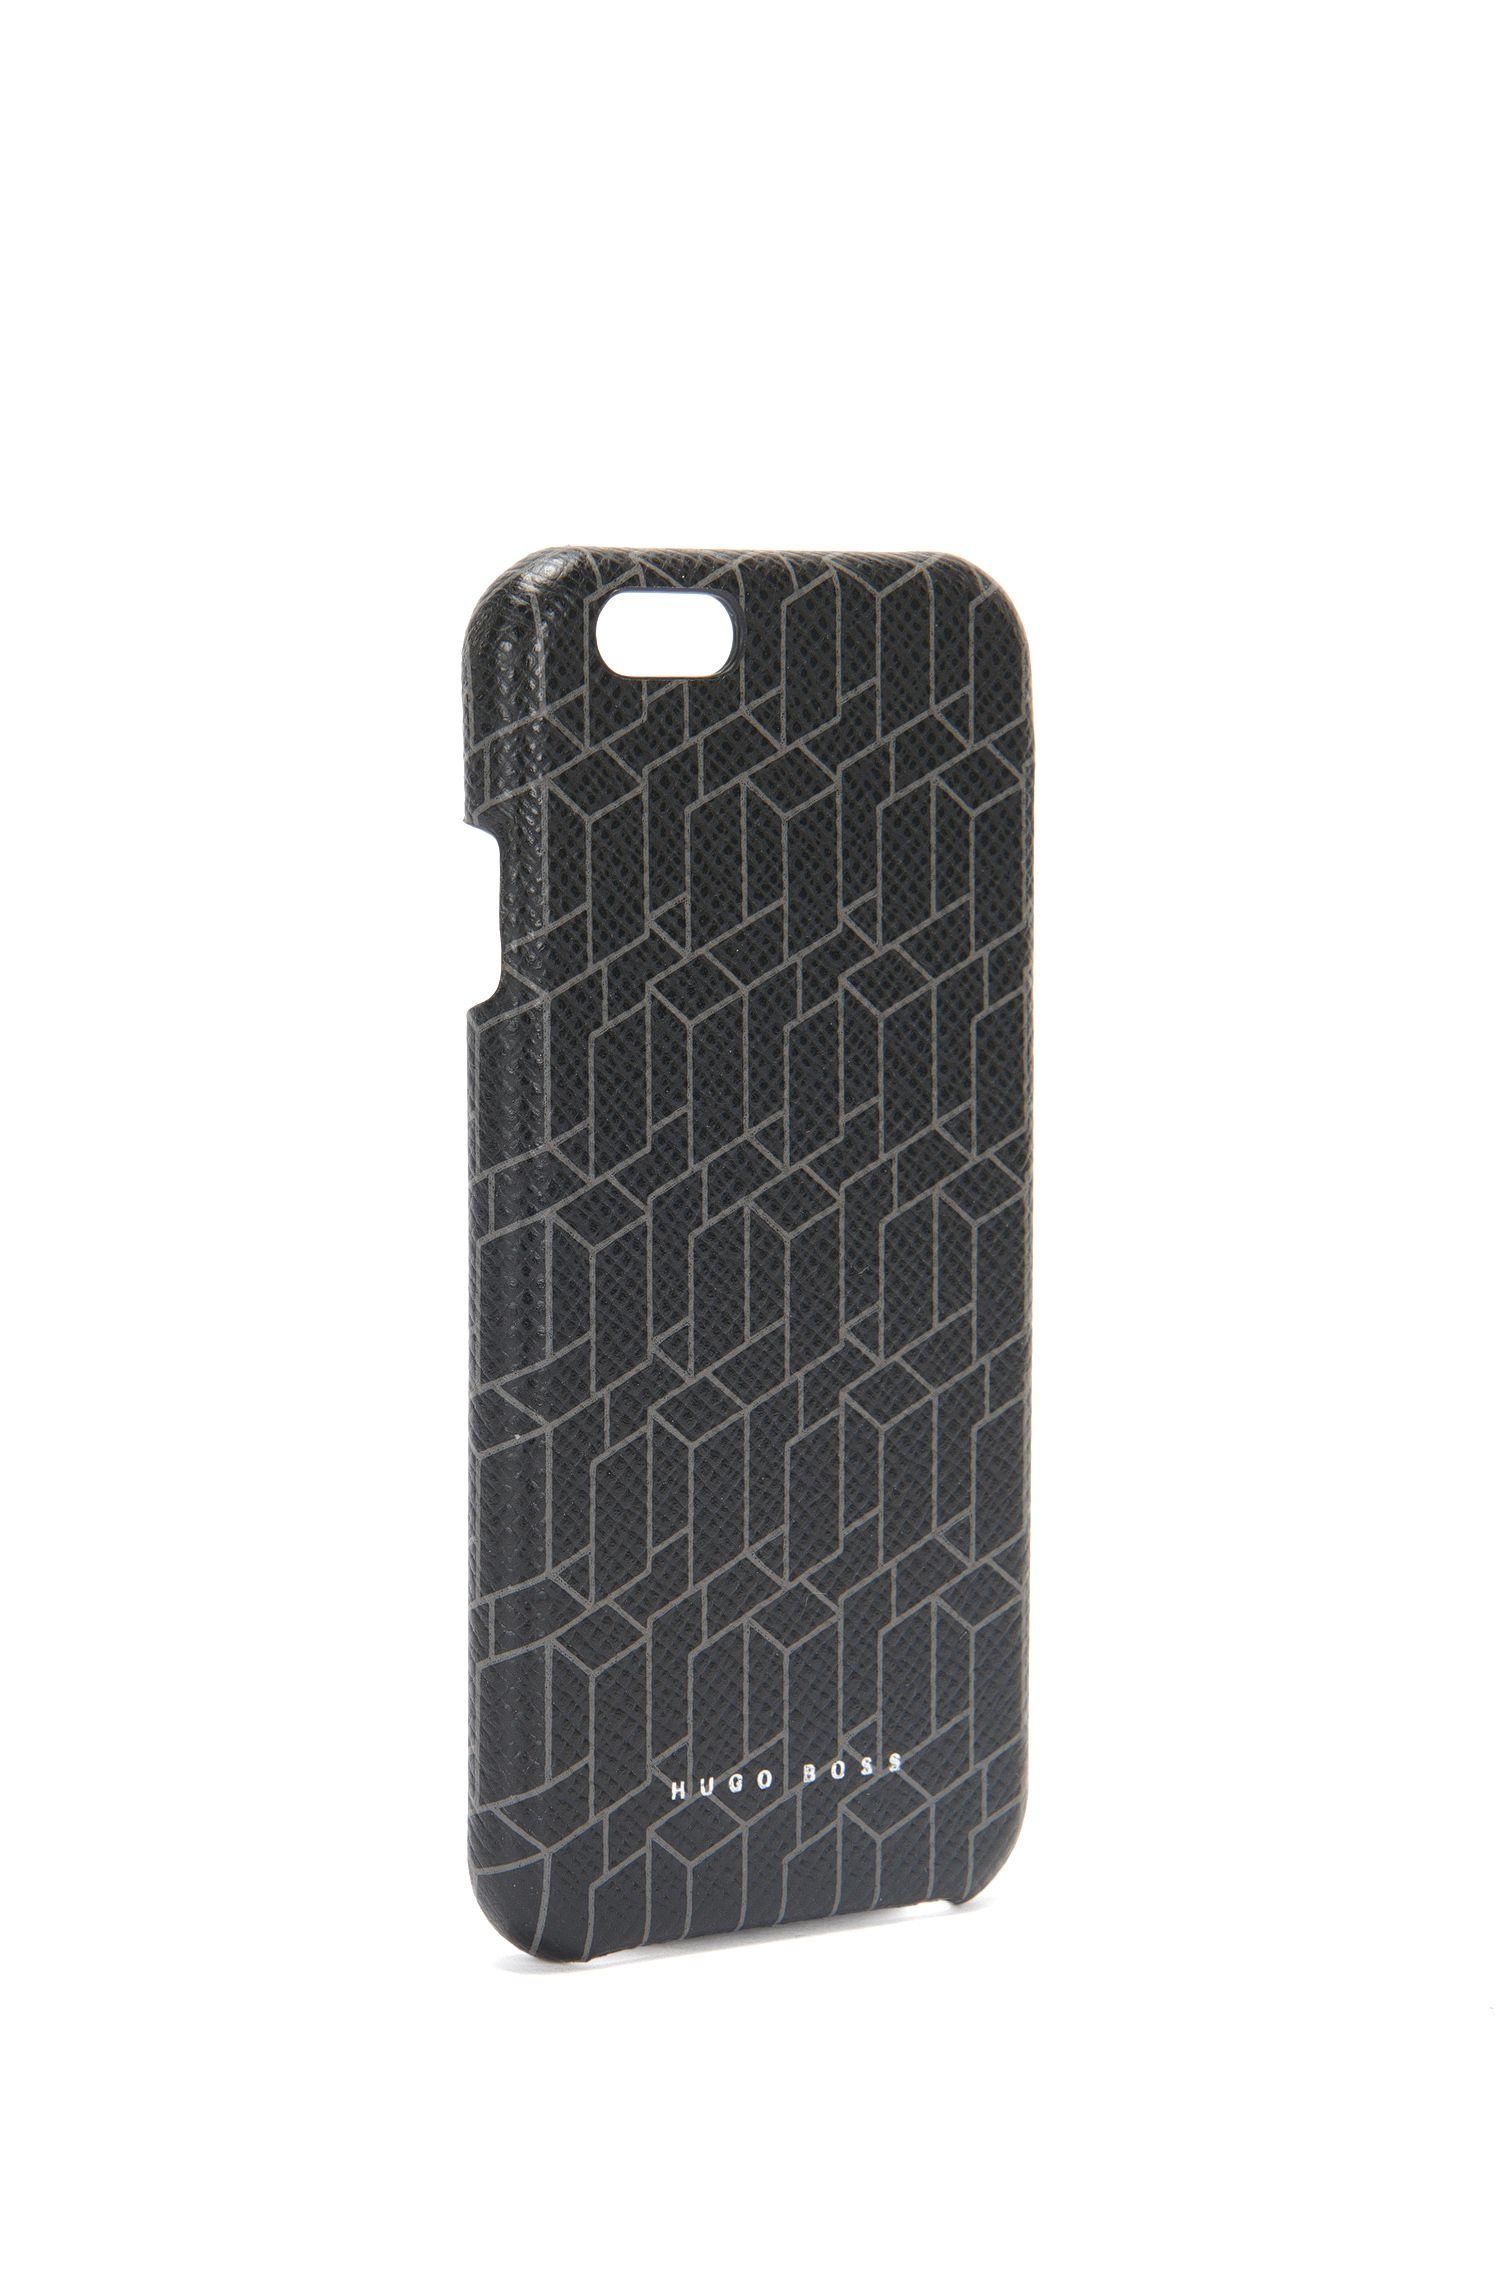 Calfskin Printed iPhone 6 Phone Case   Signature H Phone 6